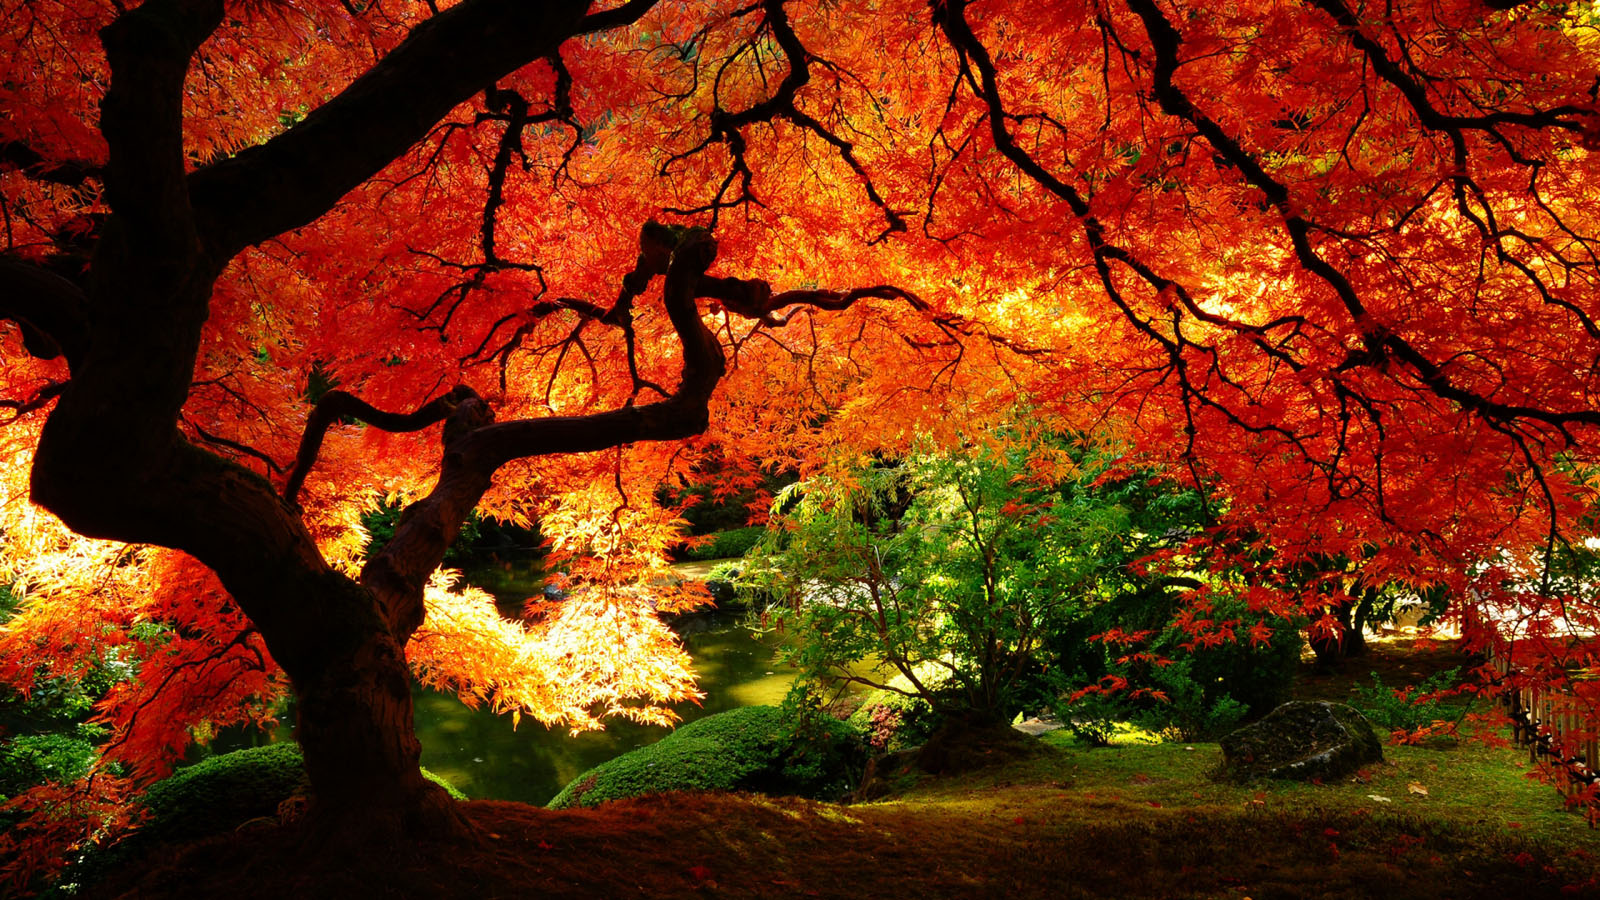 Autumn Nature Desktop - Autumn Nature Desktop